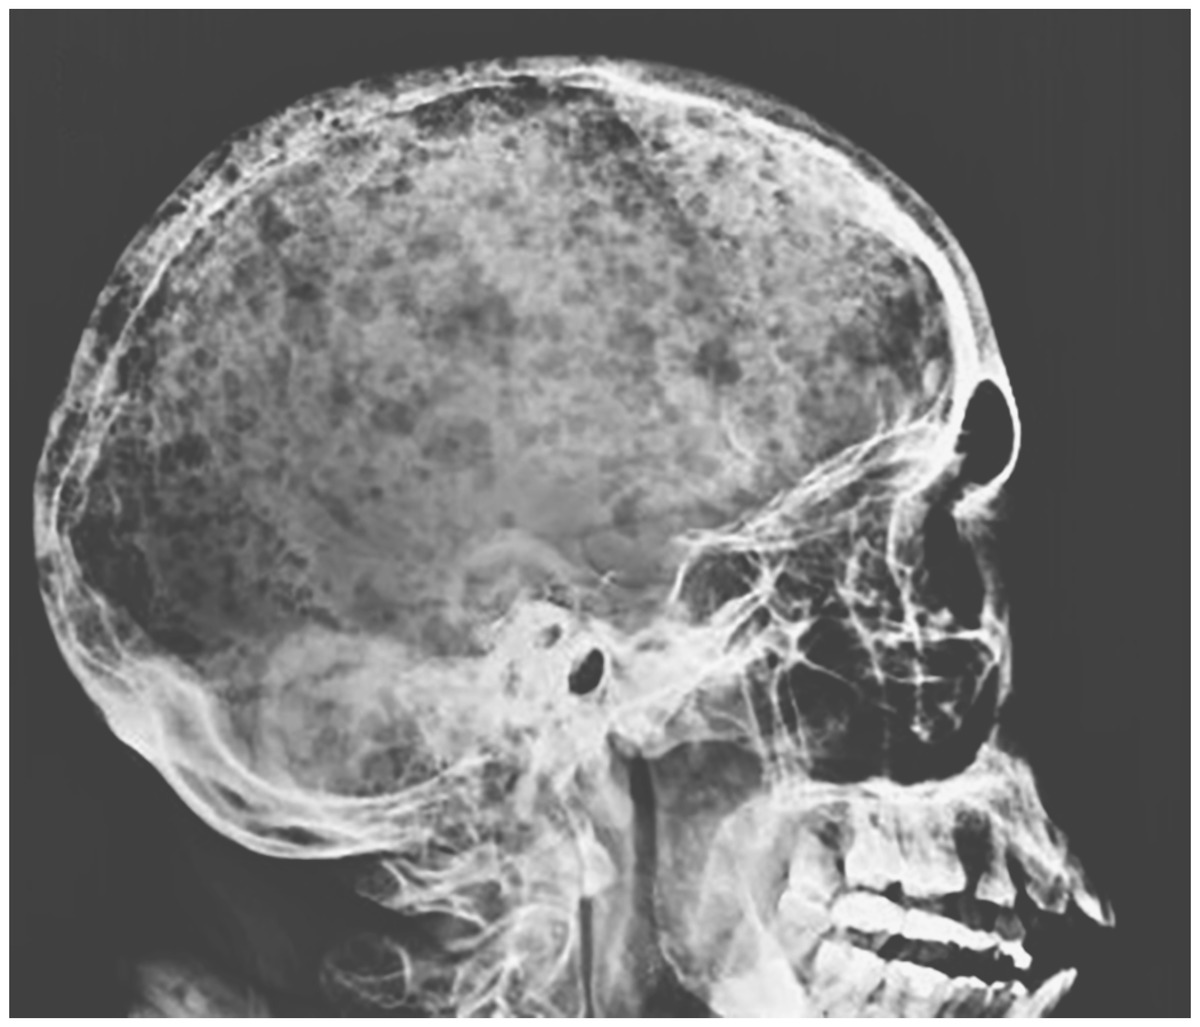 [NEJM临床医学影像]:雨滴头骨